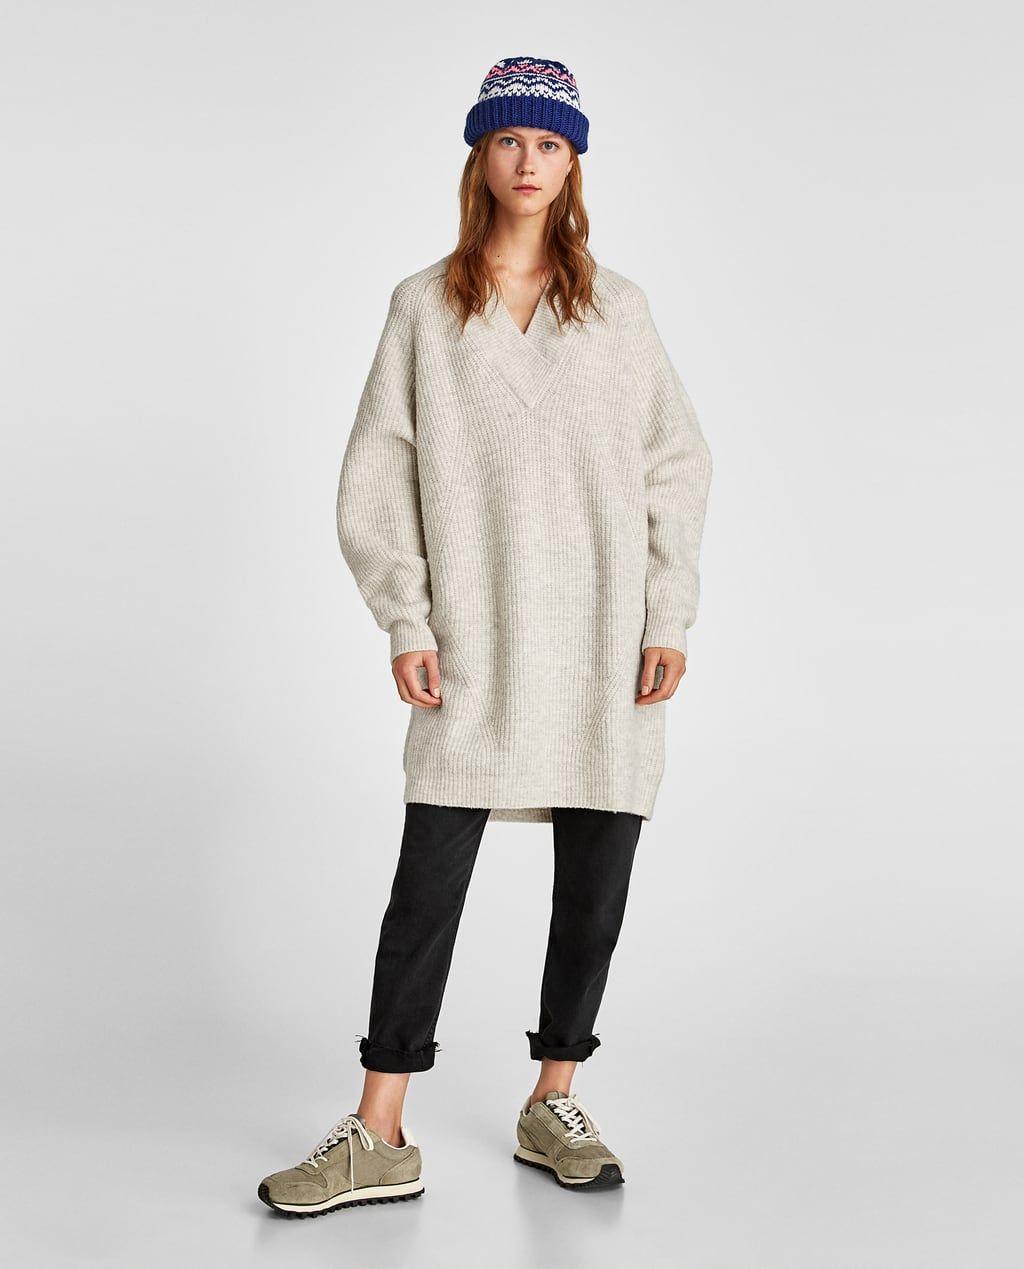 Image 1 De Robe Pull Oversize De Zara Avec Images Pull Oversize Robe Pull Robe